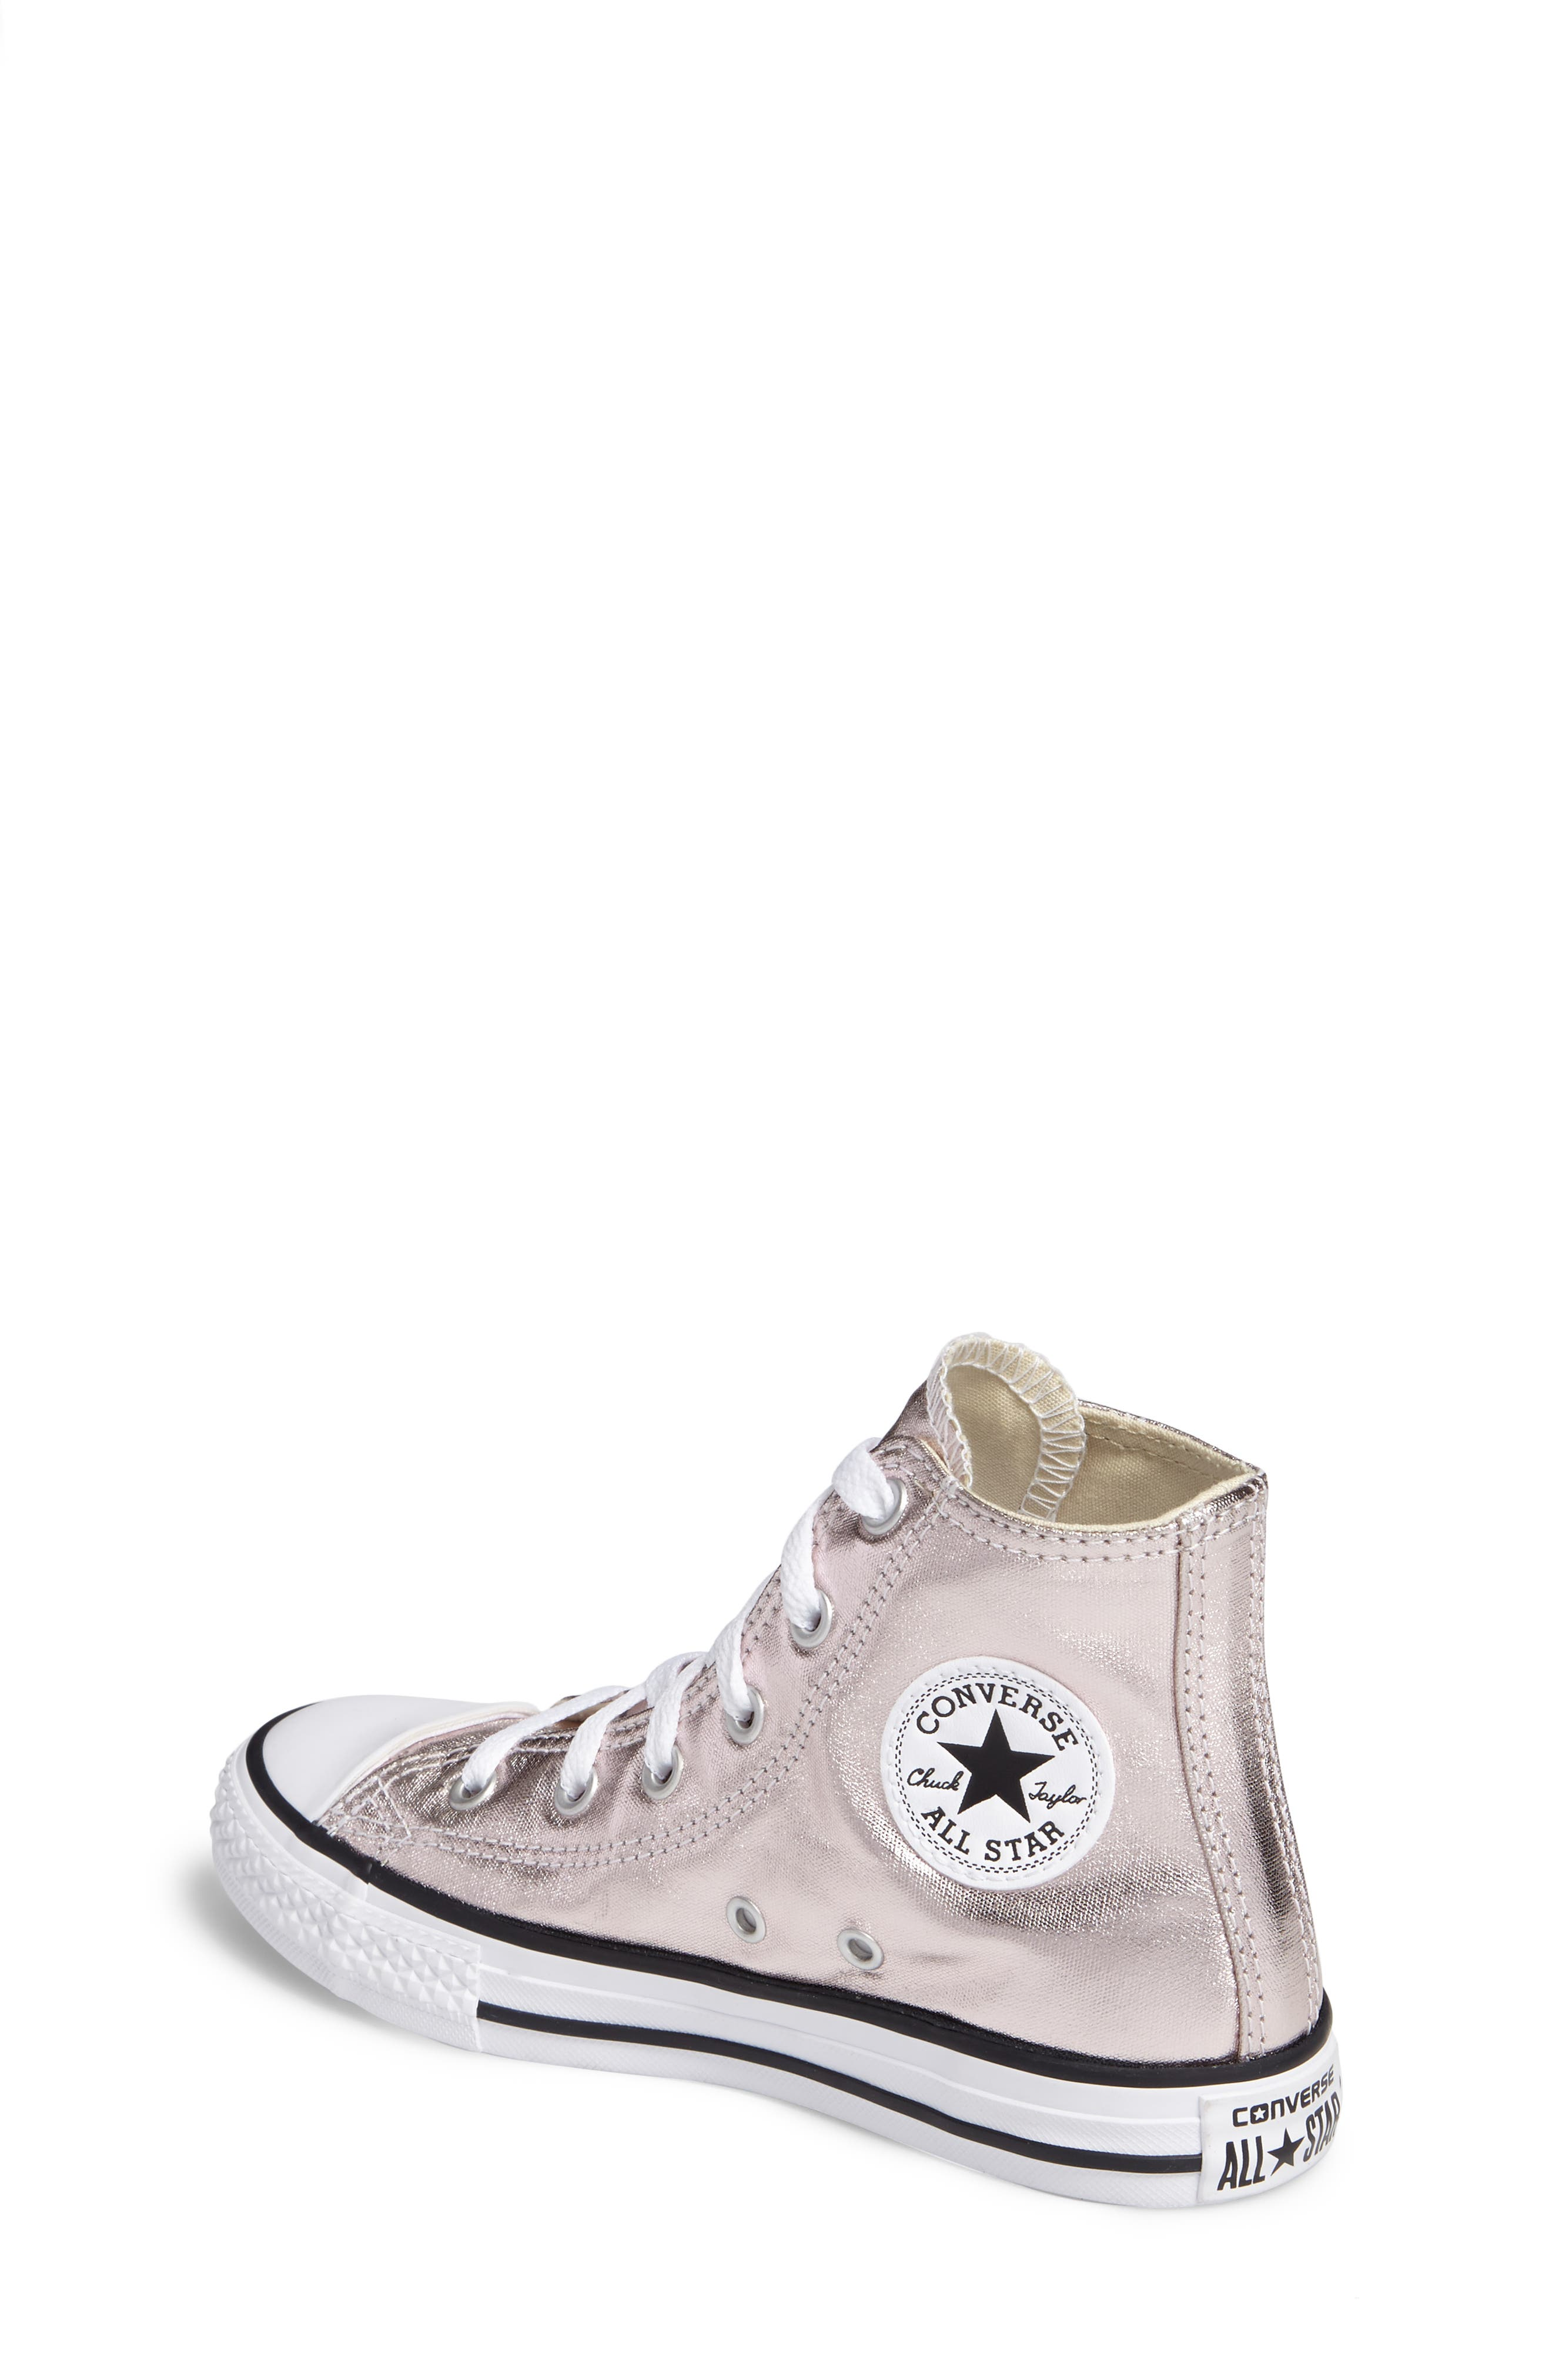 Chuck Taylor<sup>®</sup> All Star<sup>®</sup> Seasonal Metallic High Top Sneaker,                             Alternate thumbnail 2, color,                             221